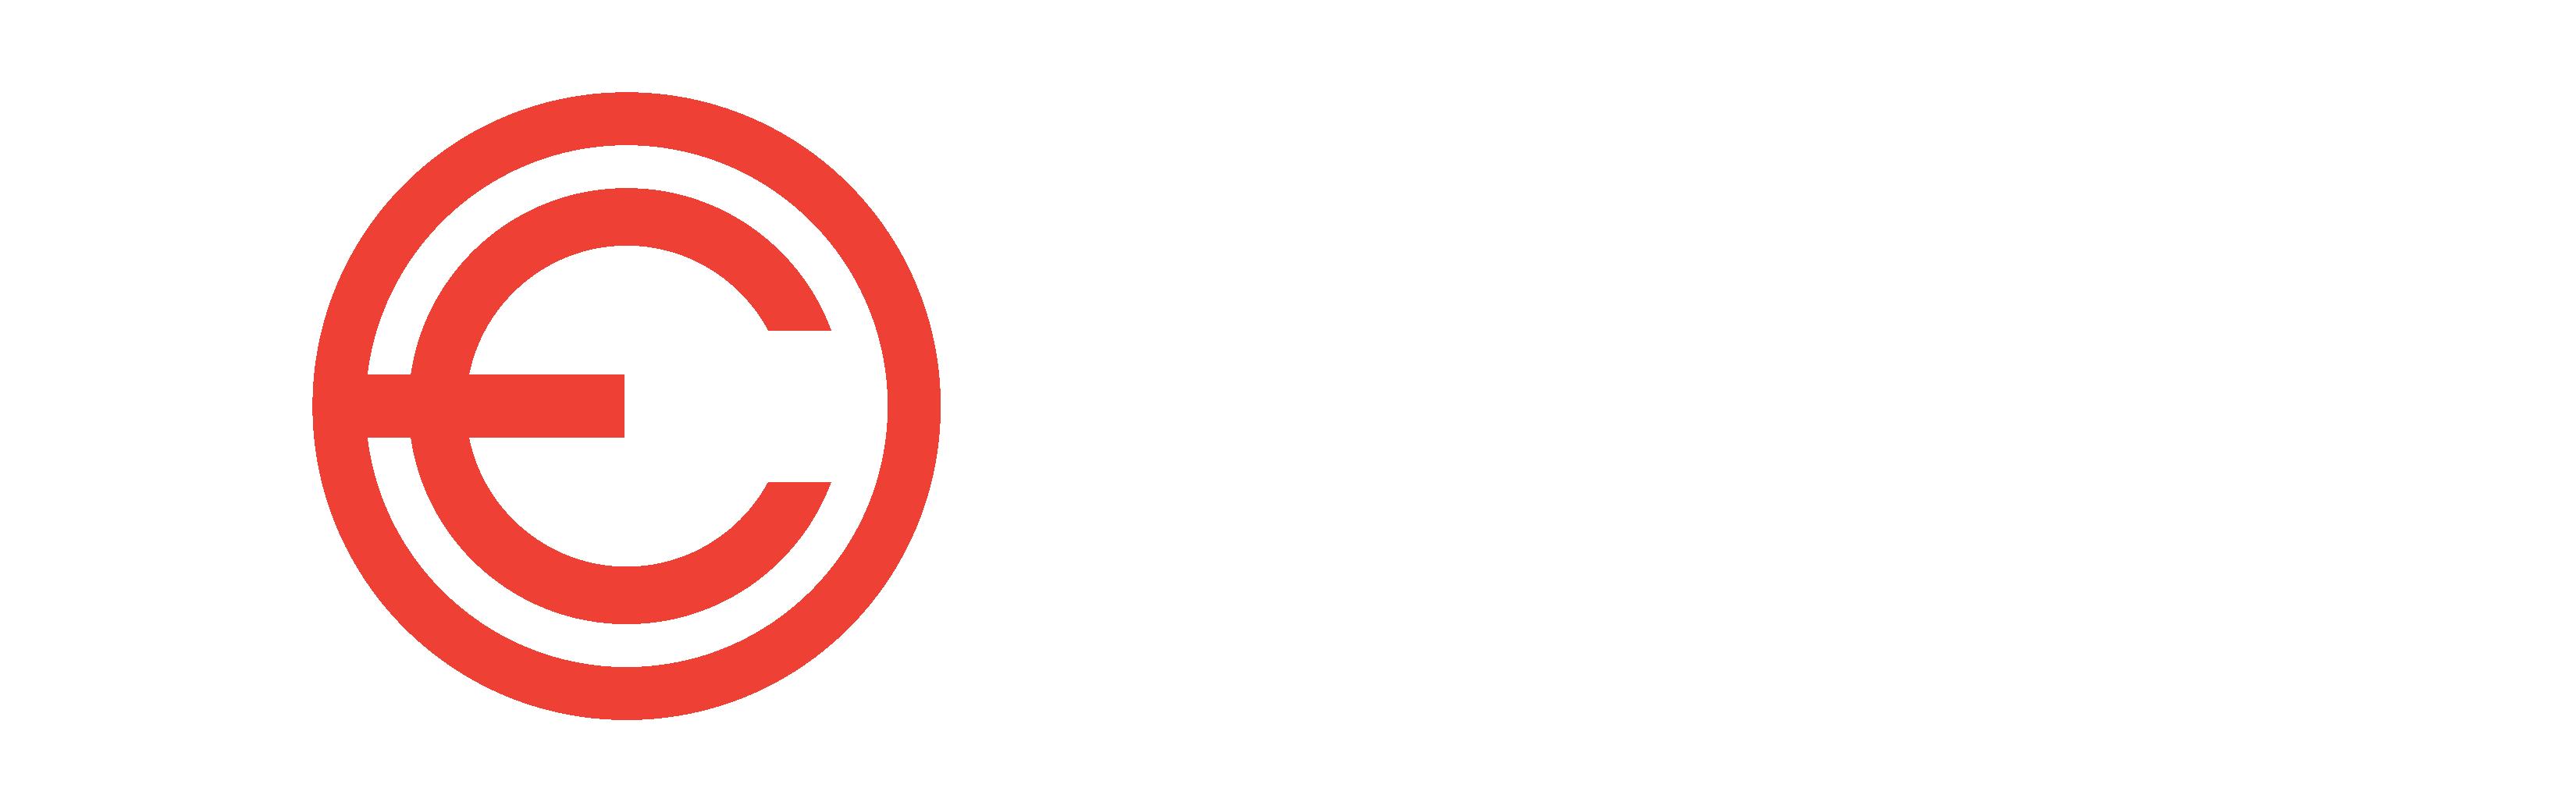 CEO-logo-white-01.png